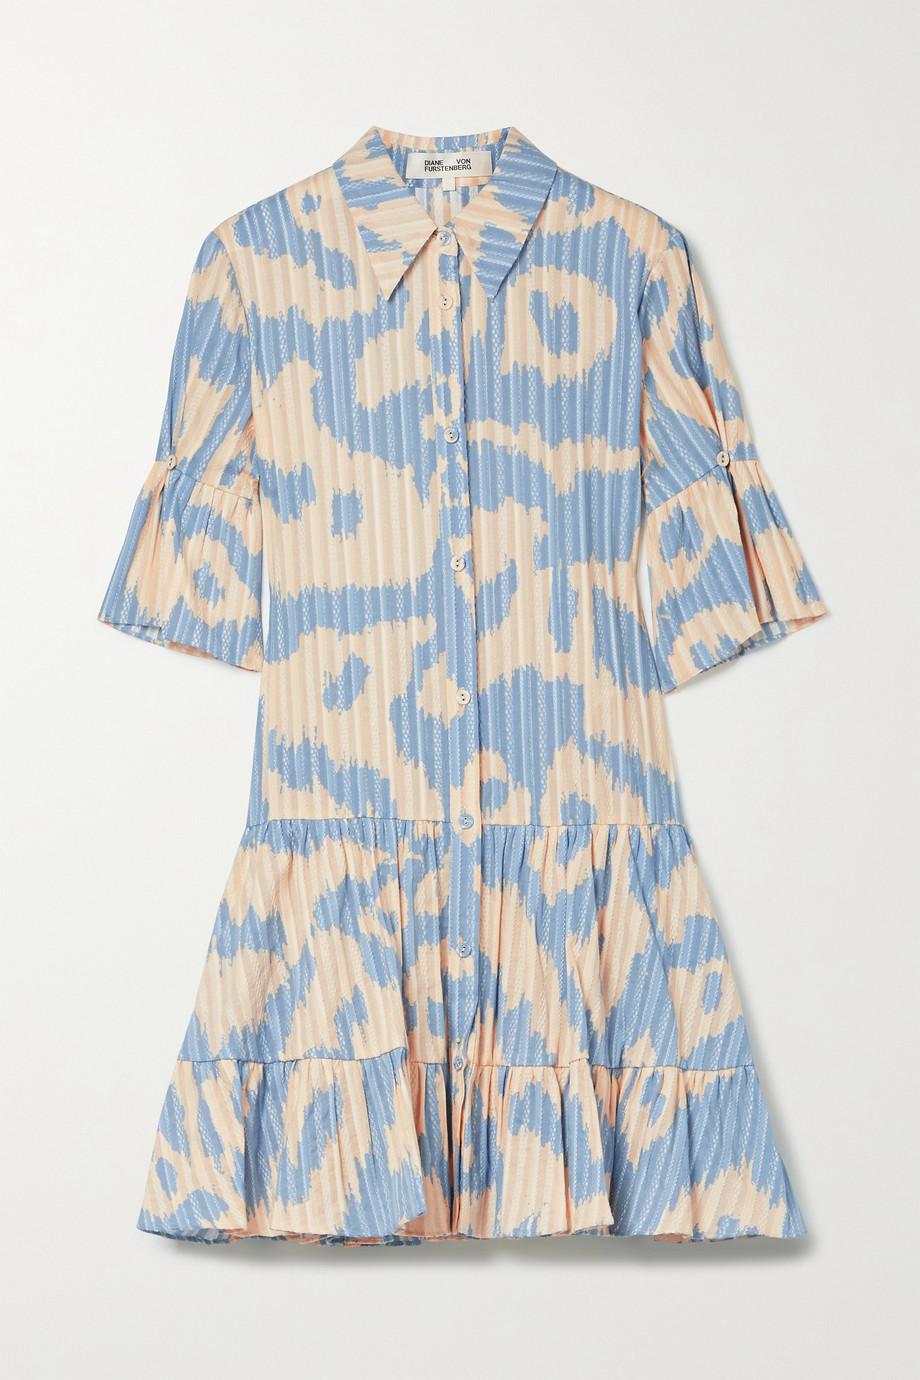 Diane von Furstenberg Beata tiered leopard-print cotton-jacquard mini shirt dress